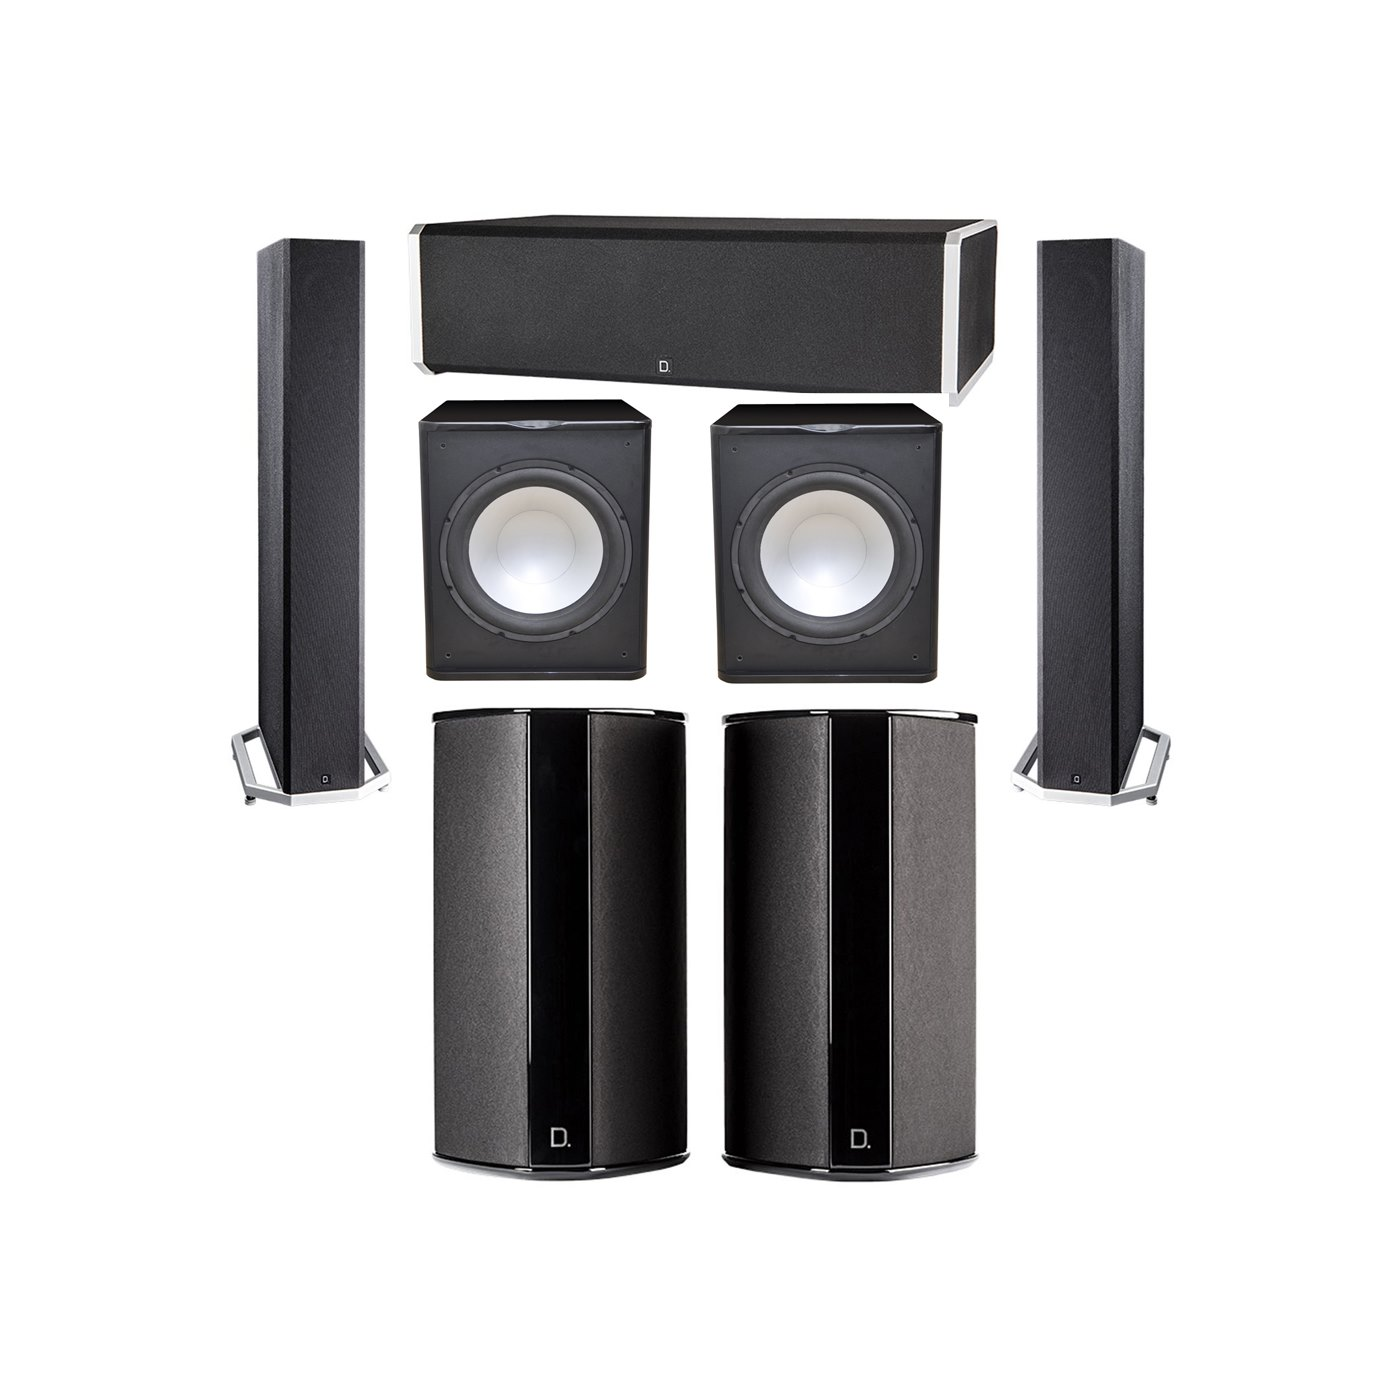 Definitive Technology 5.2 System with 2 BP9040 Tower Speakers, 1 CS9060 Center Channel Speaker, 2 SR9080 Surround Speaker, 2 Premier Acoustic PA-150 Subwoofer